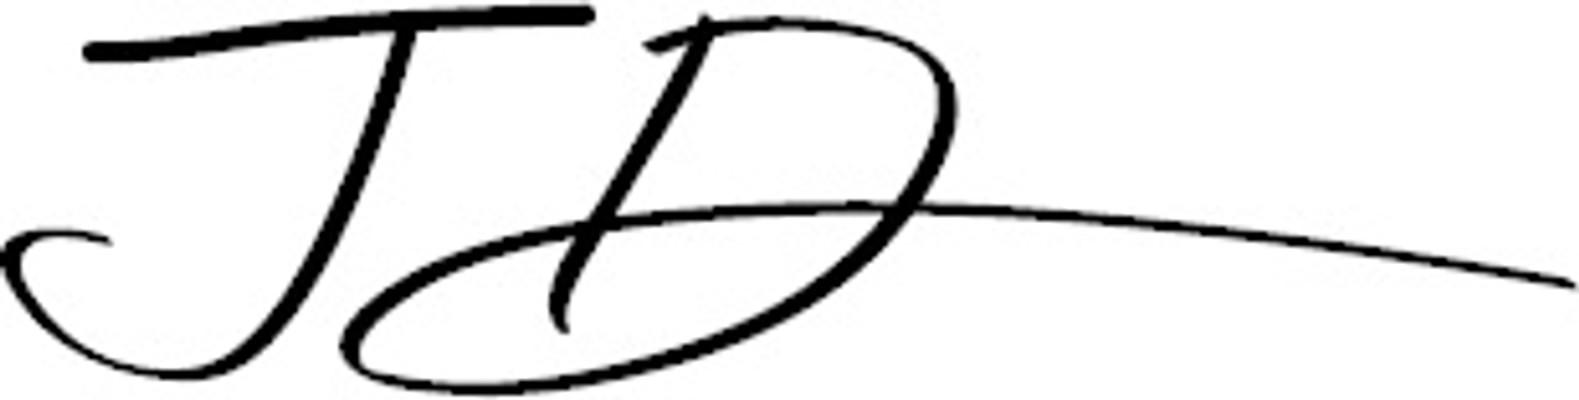 f0007-01